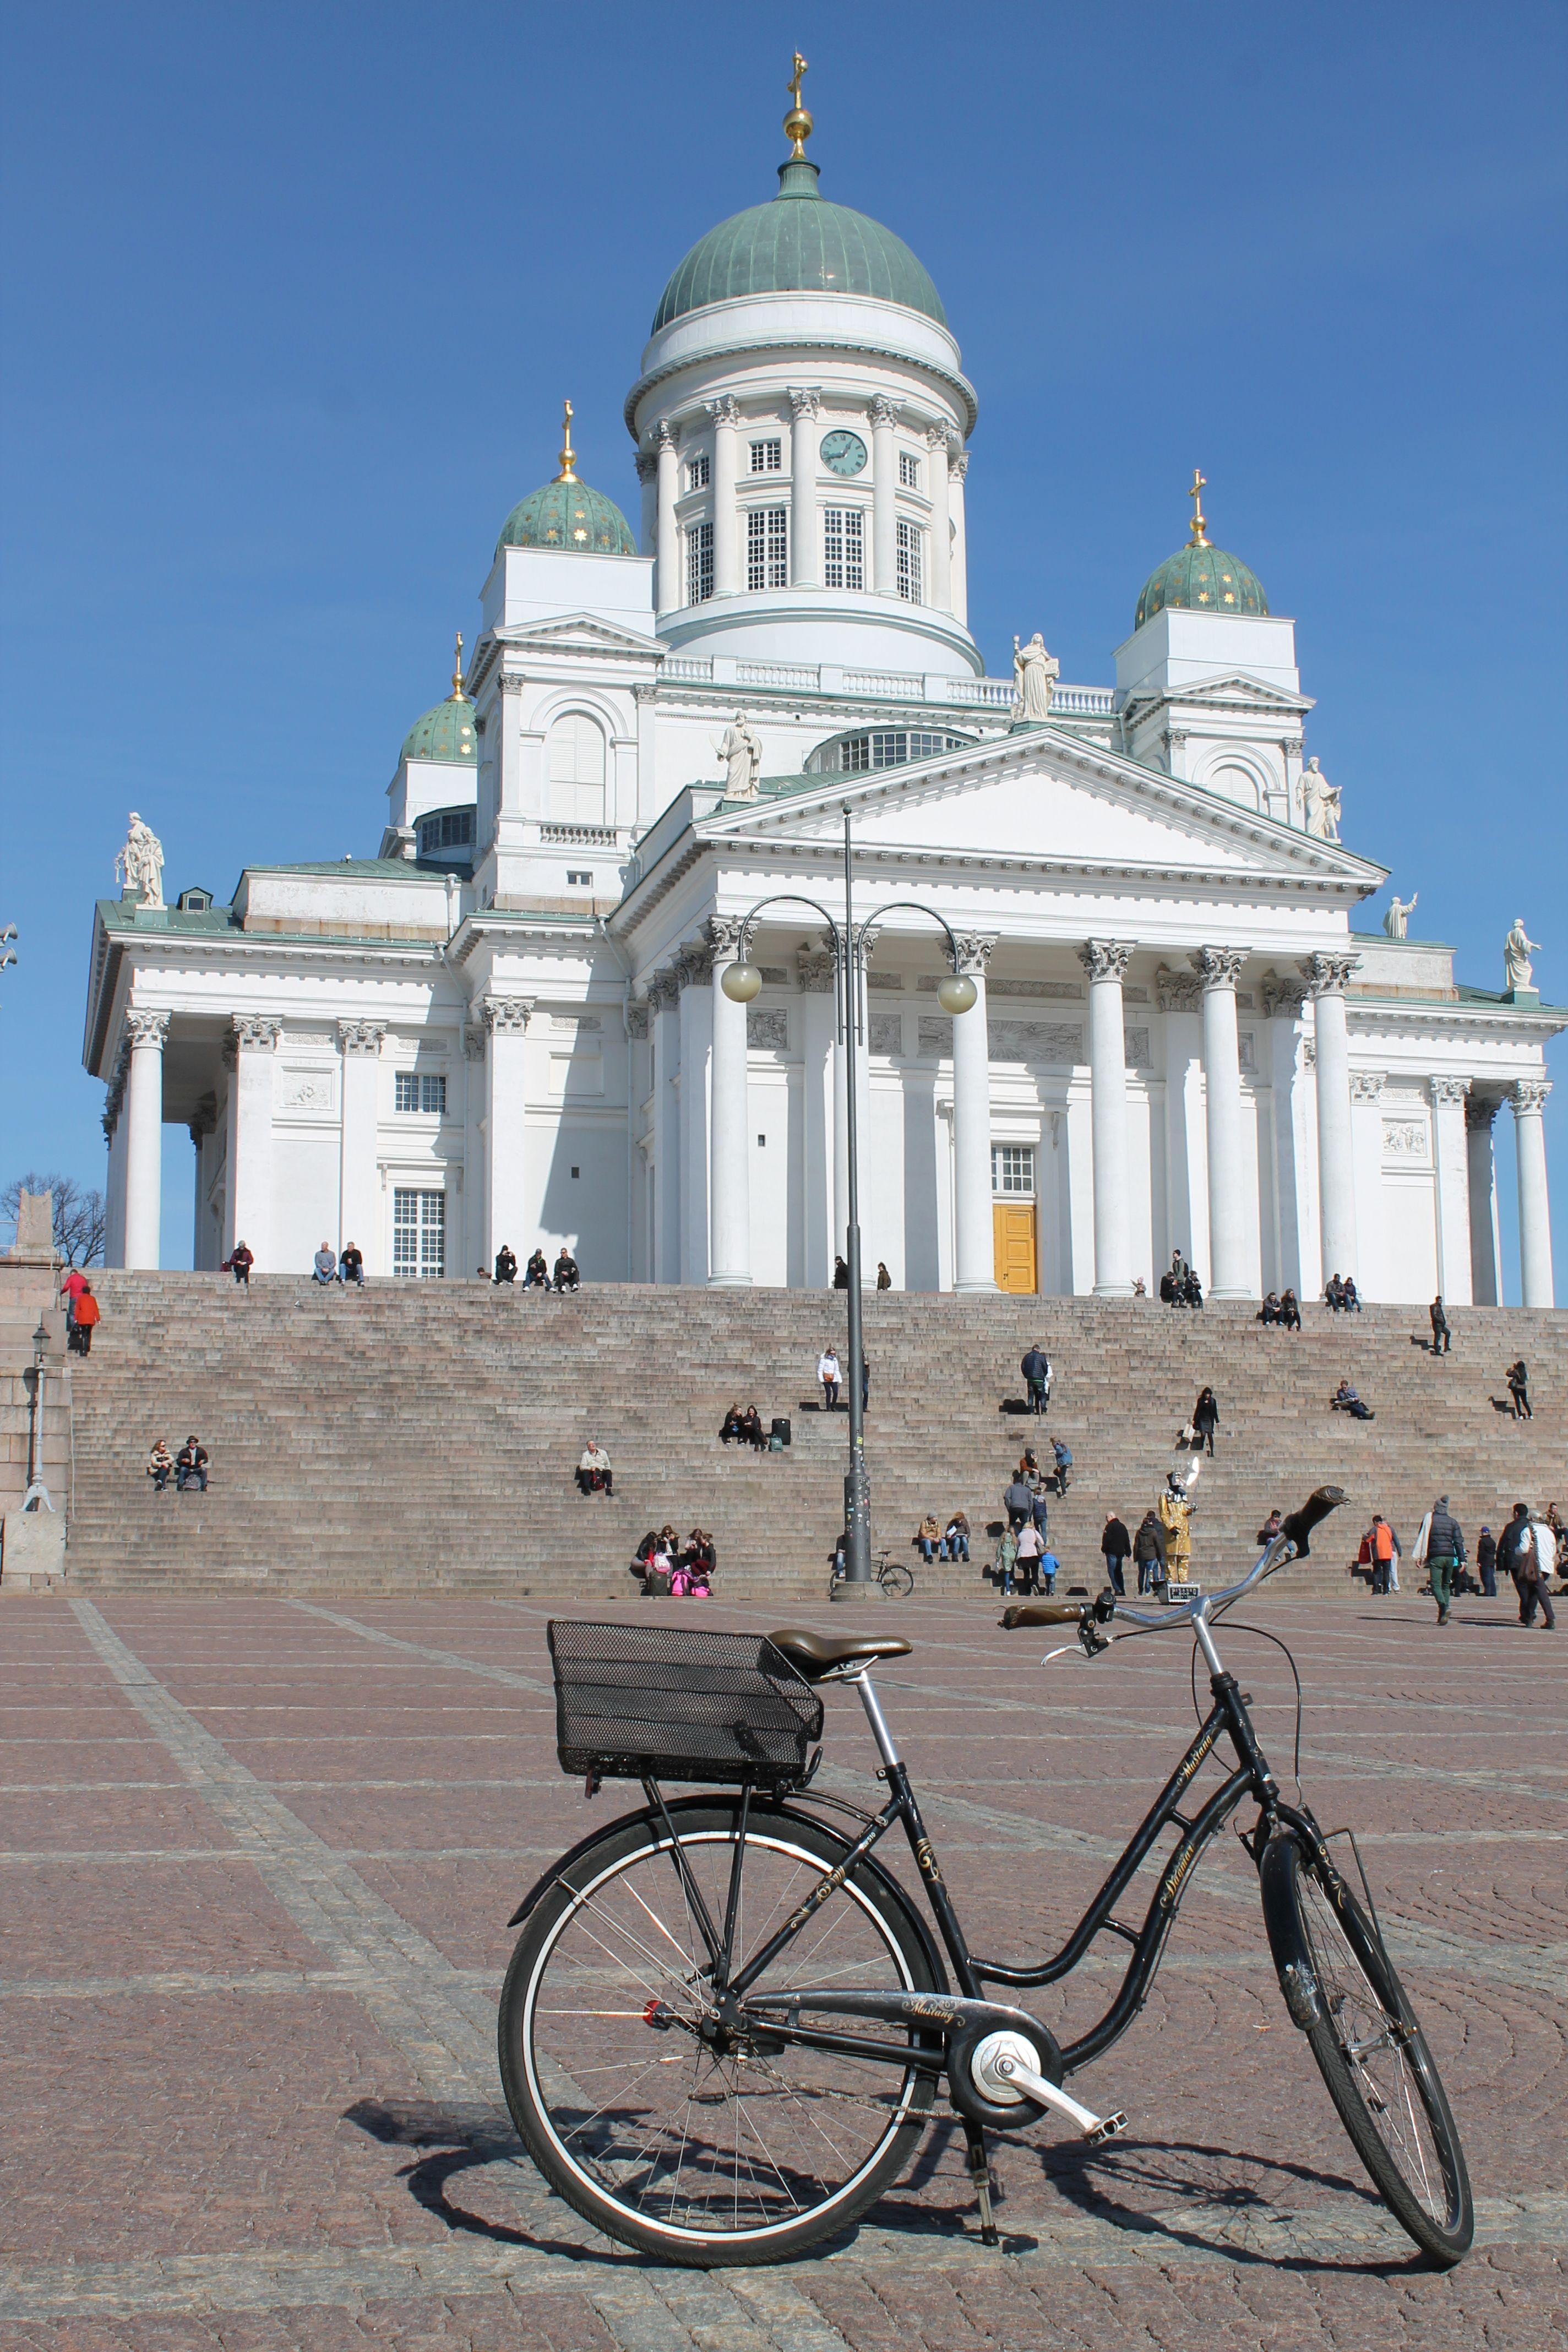 katedralis_bicikli.jpg